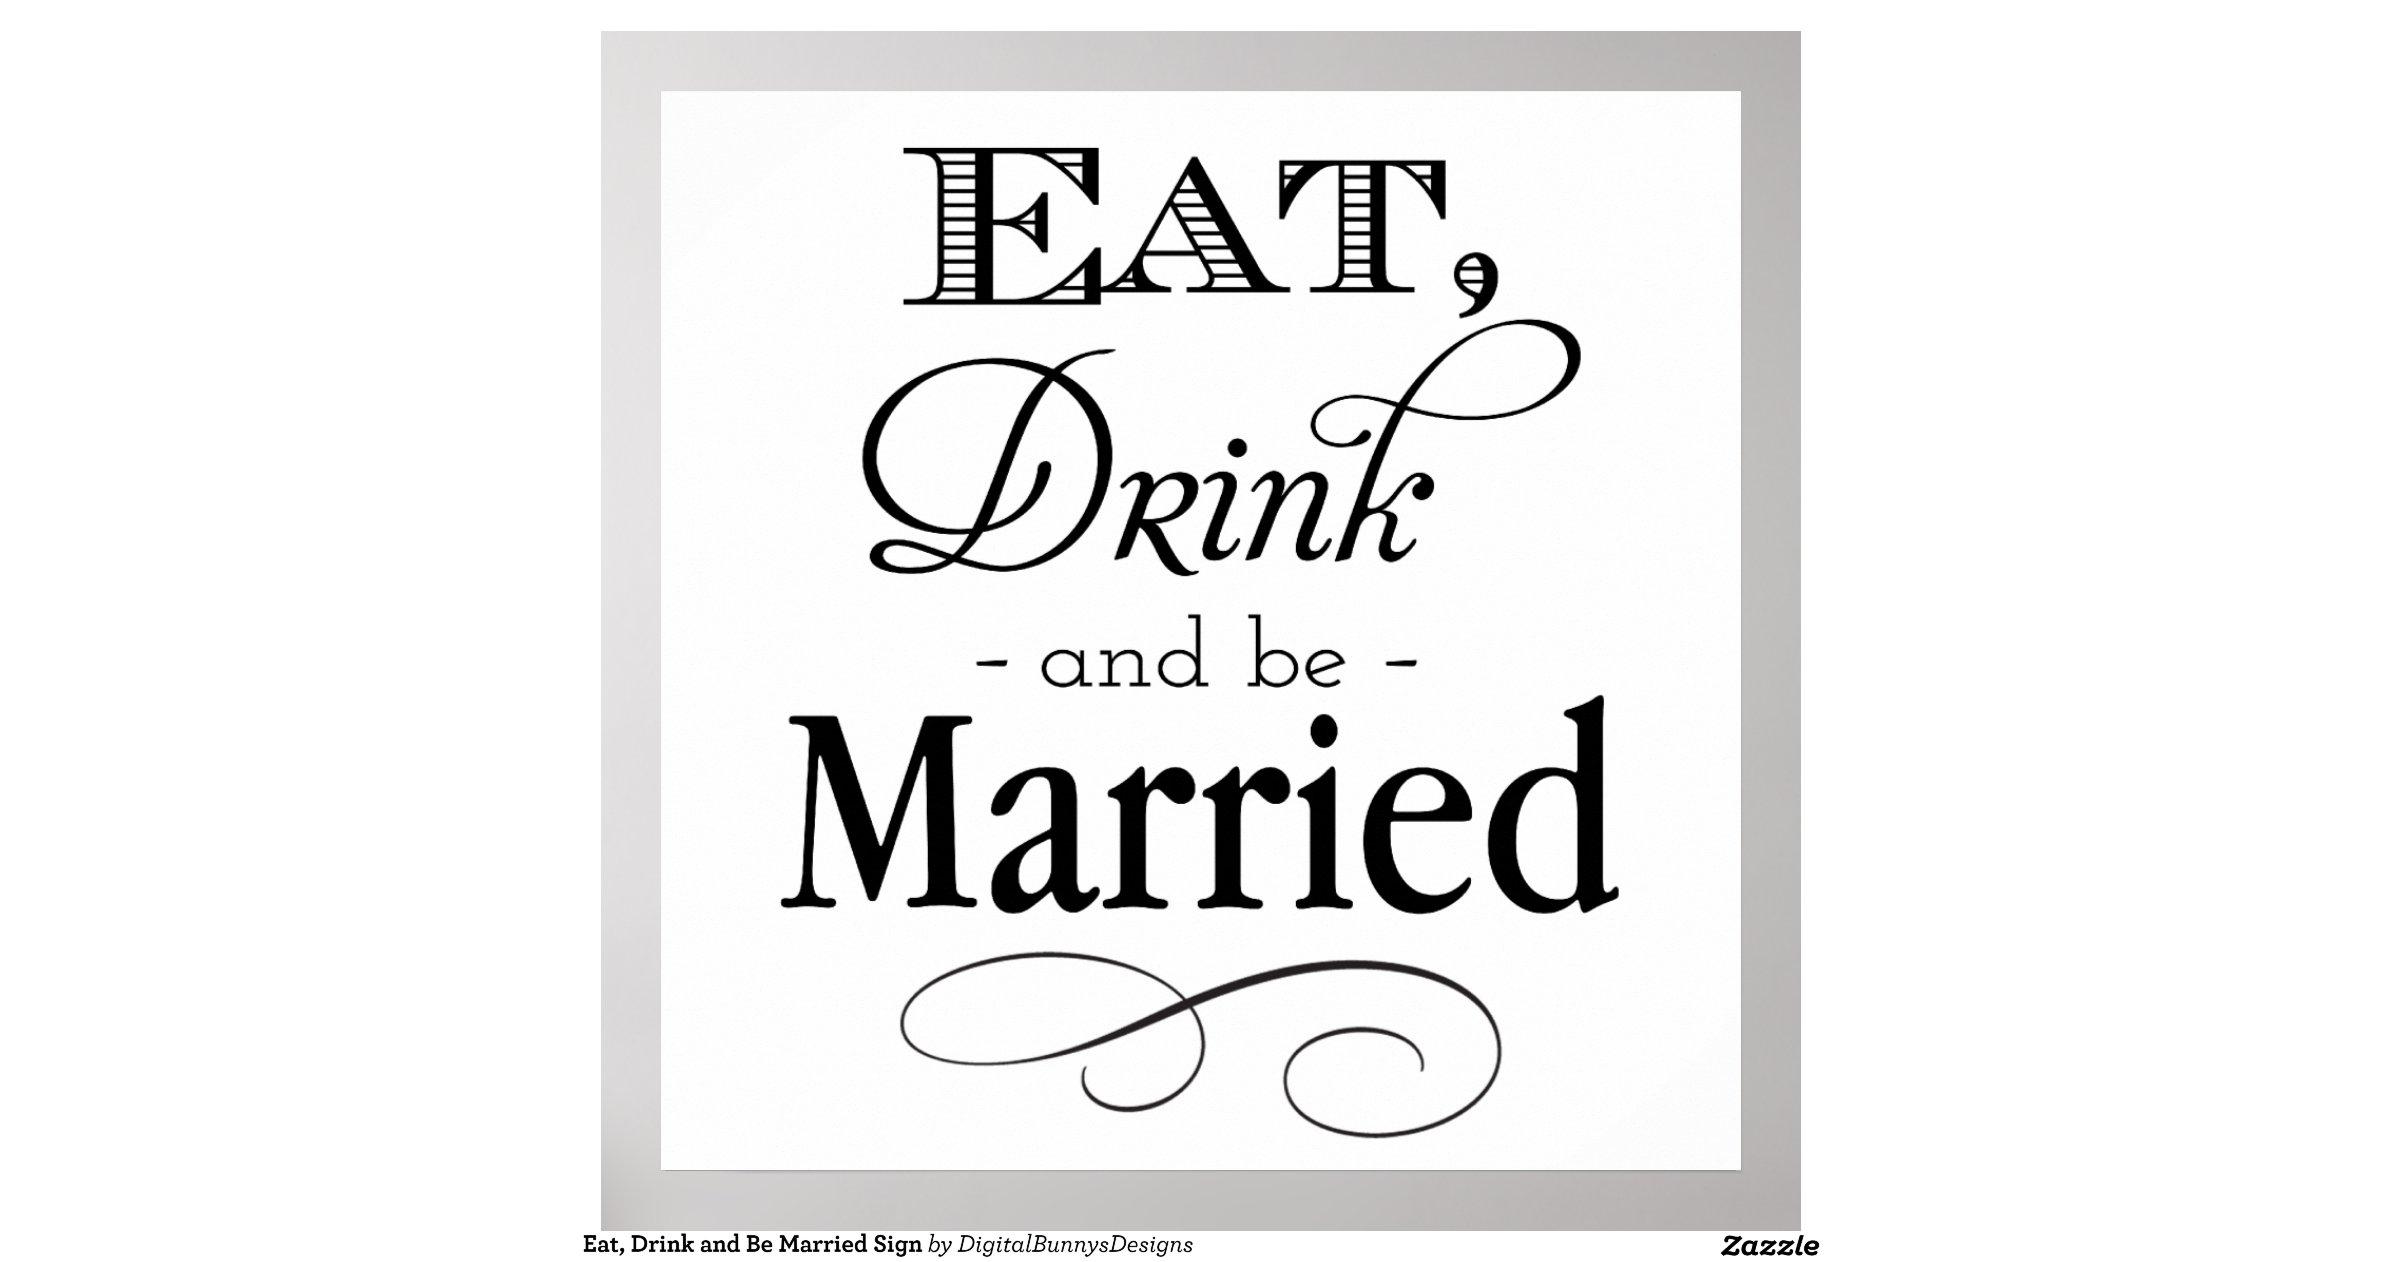 Eatdrinkandbemarriedsignposter